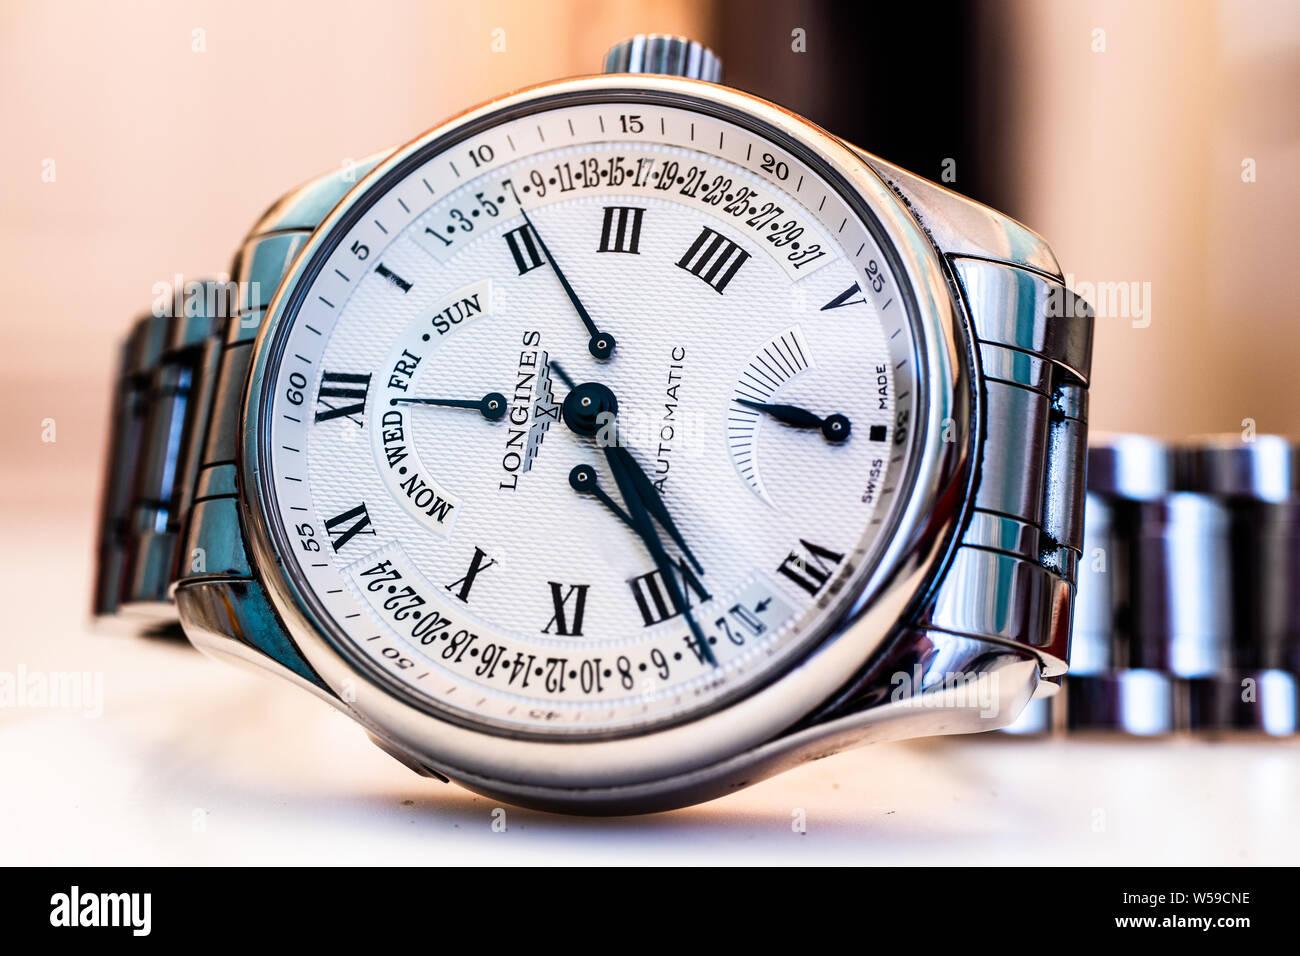 Lodz, Poland, Apr 2019 Longines hand watch, macro, luxury watch company, Longines winged hourglass logo registered 1889 is oldest unchanged trademark Stock Photo